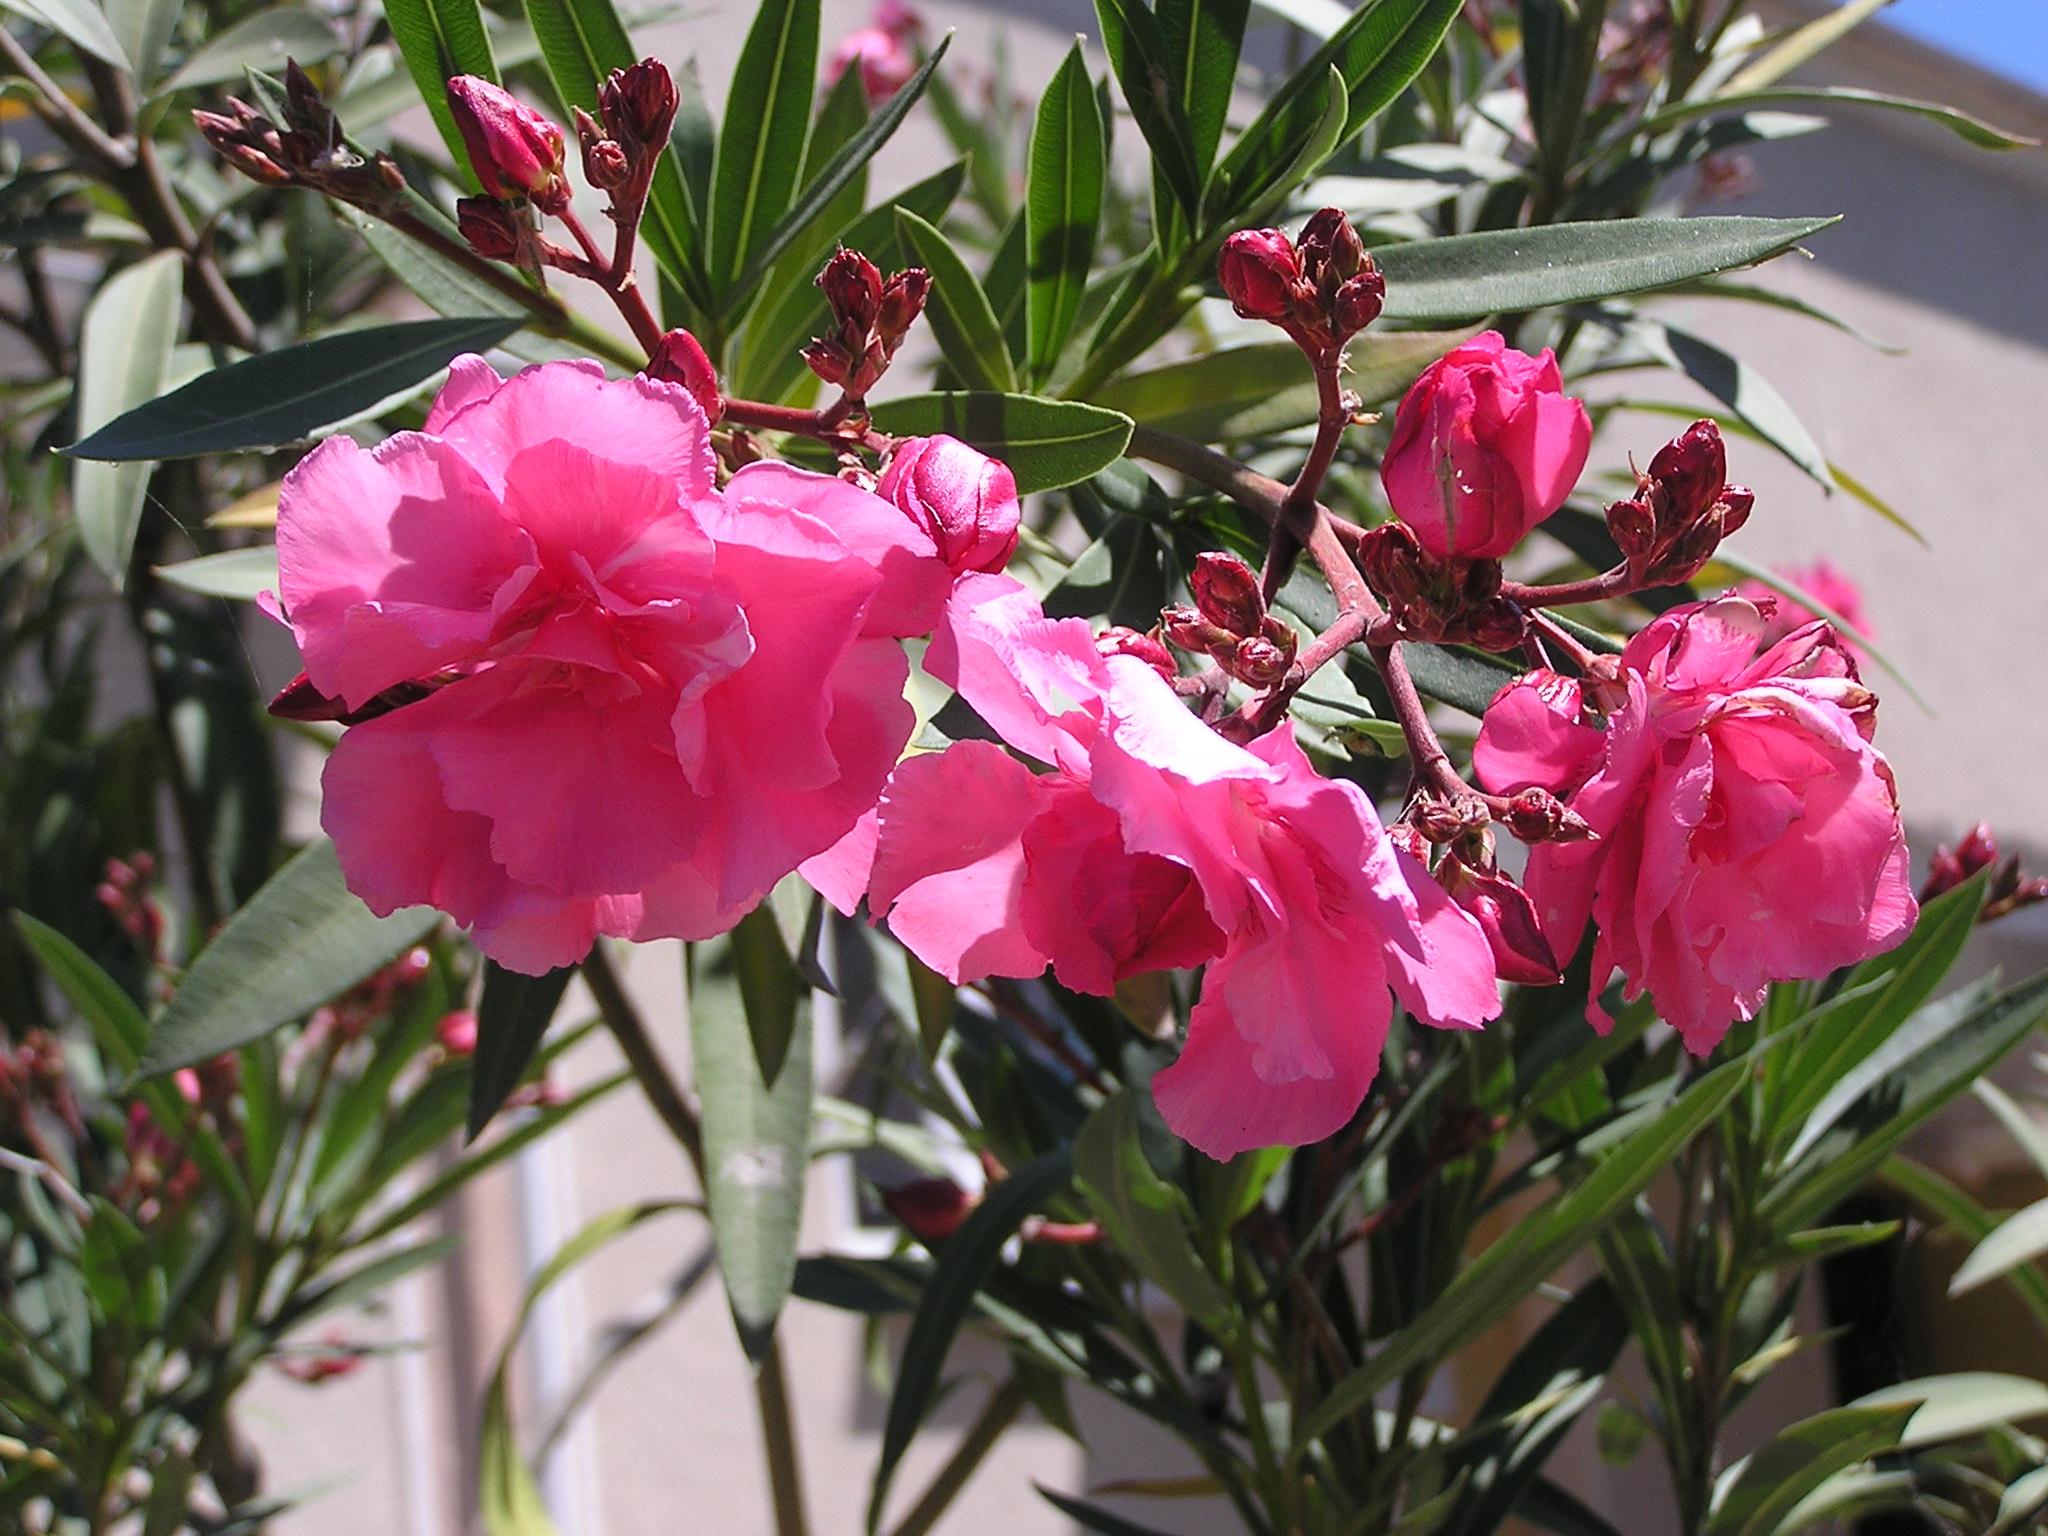 file nerium oleander cultivars in sedovo wikimedia. Black Bedroom Furniture Sets. Home Design Ideas